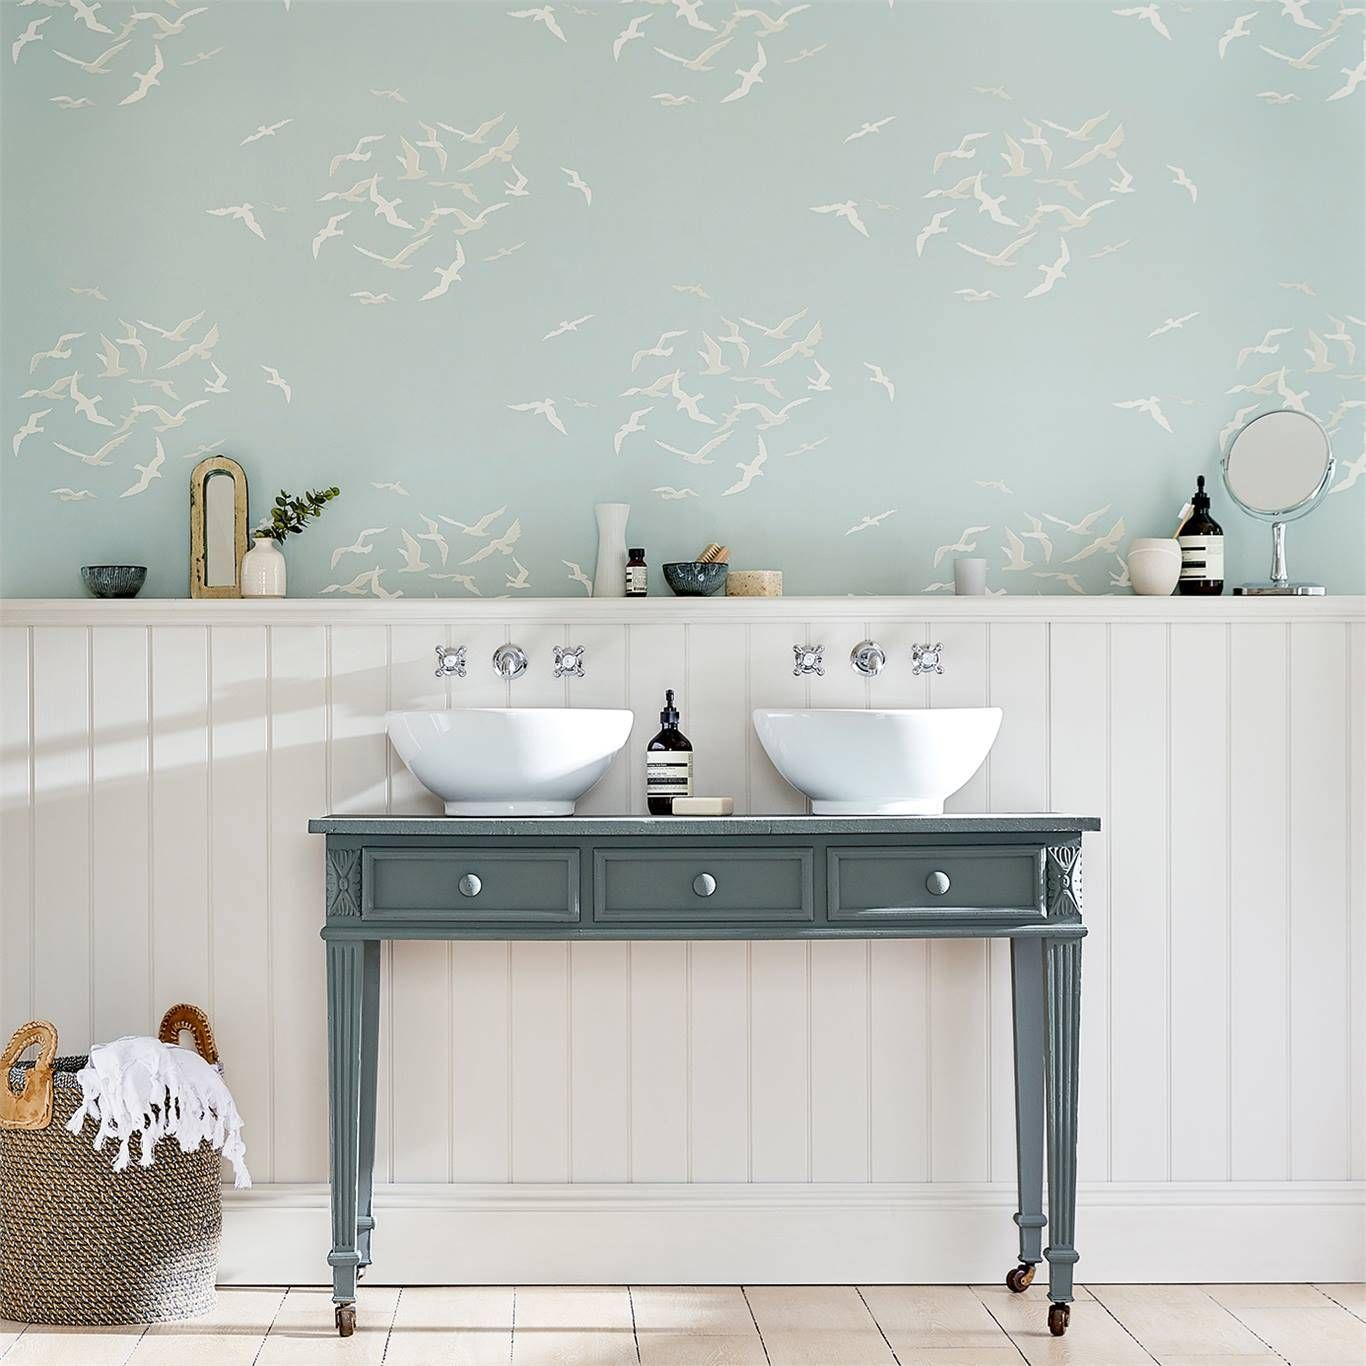 Larina 216578 Bathroom Wallpaper Trends Home Wallpaper Interior